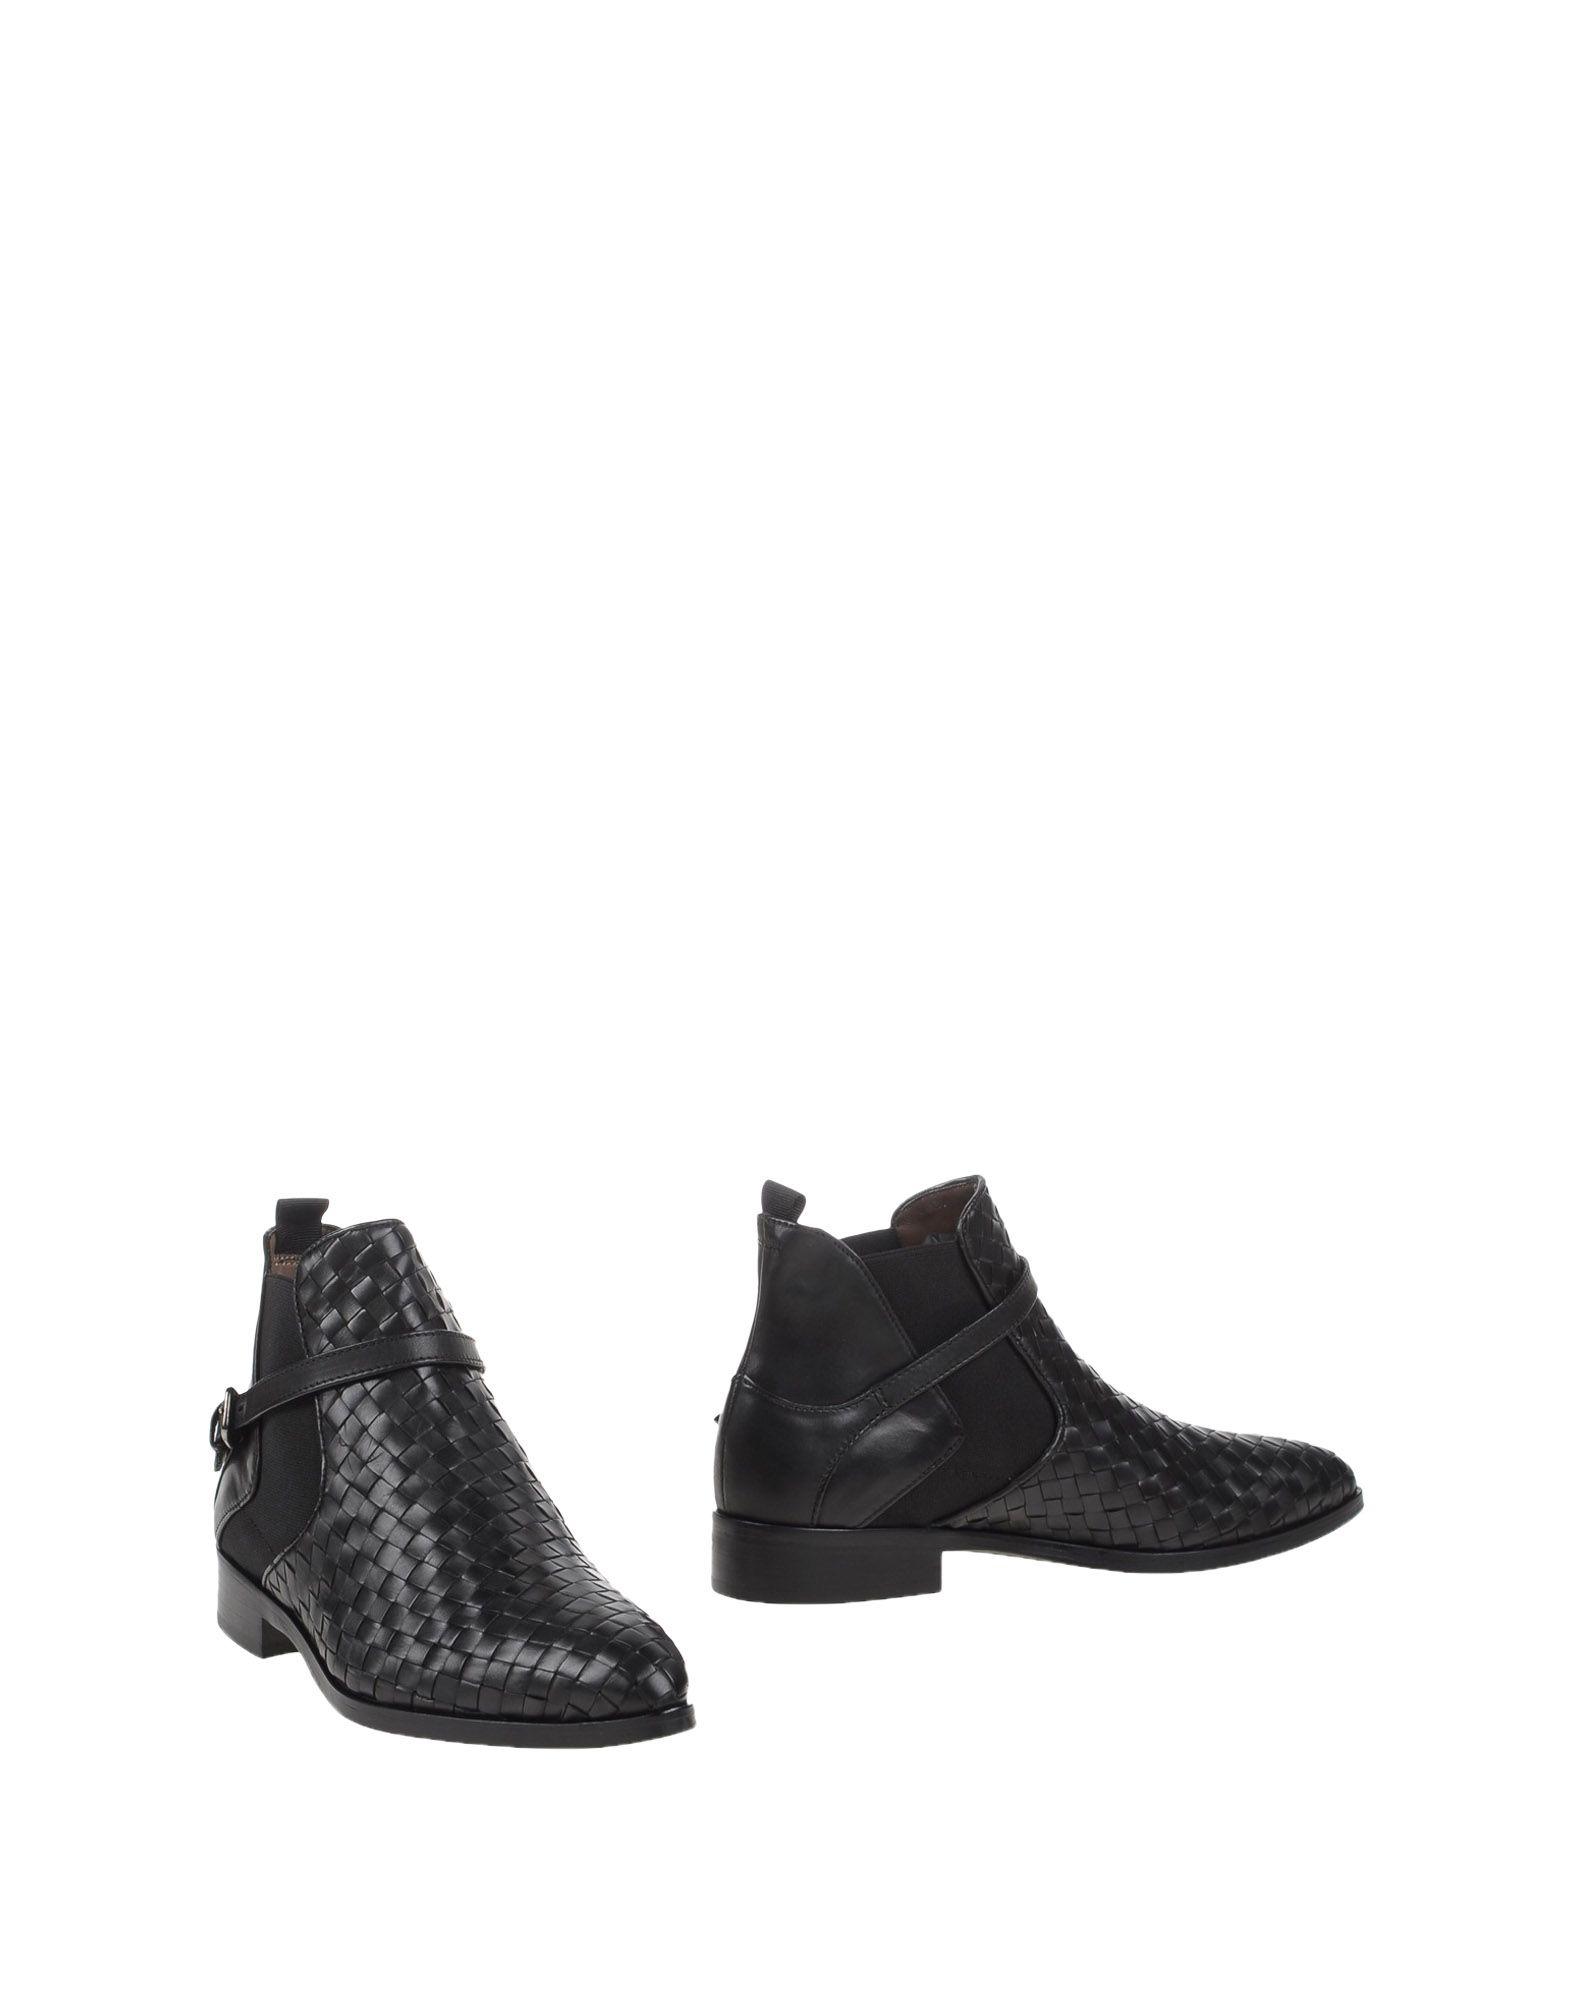 Stilvolle billige Schuhe Pons 44874728KI Quintana Stiefelette Damen  44874728KI Pons eaca0b